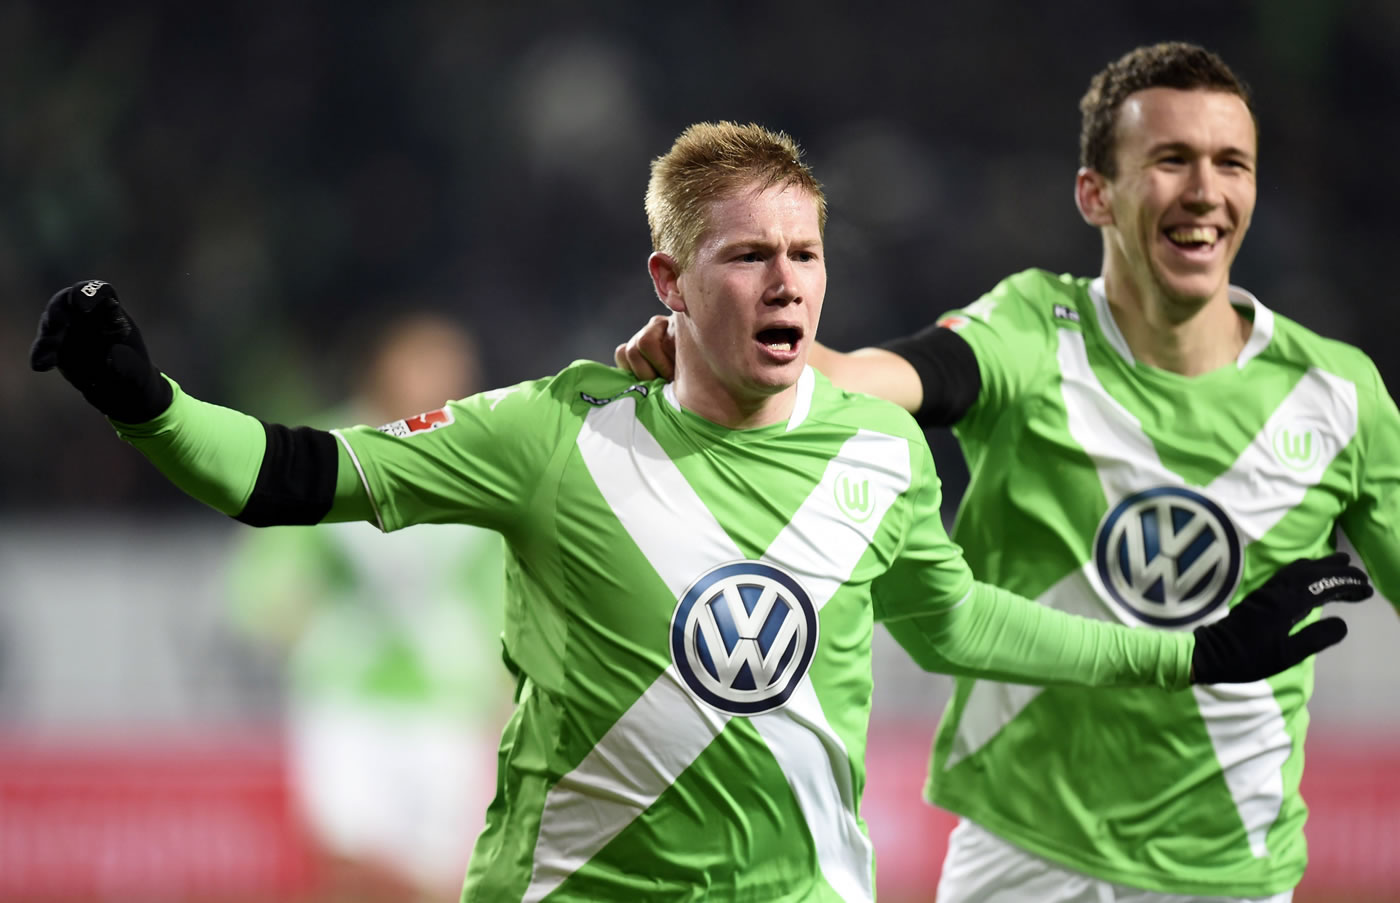 Wolfsburgo 4-1 Bayern Múnich (Bundesliga)